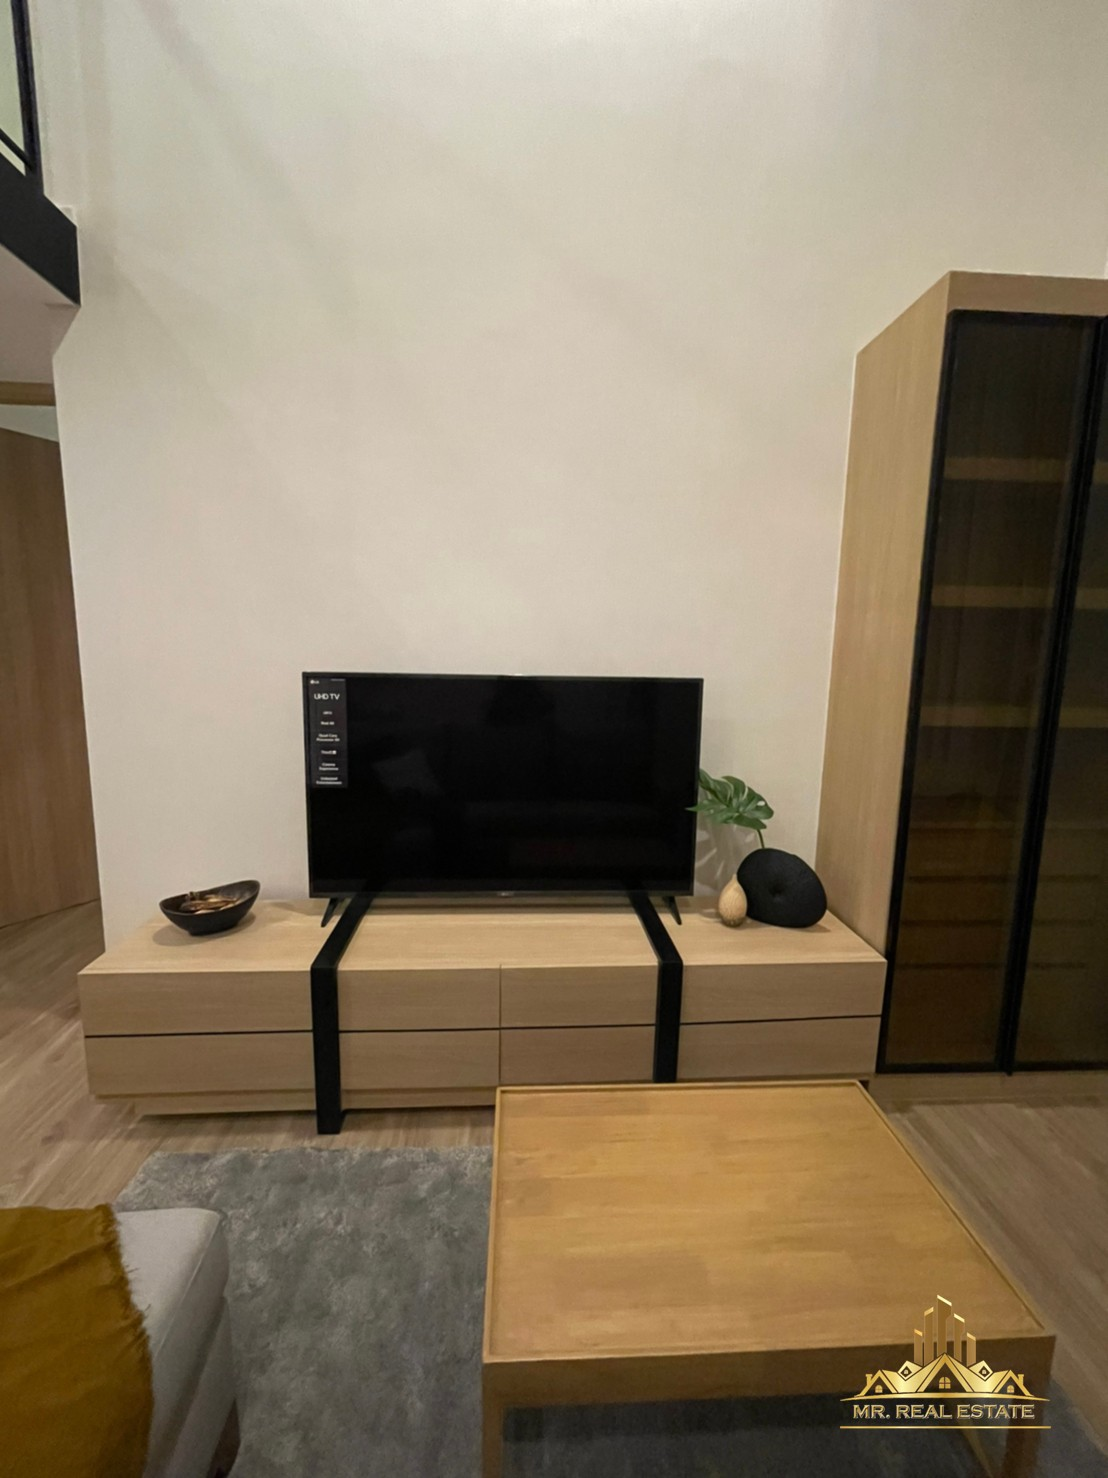 Ramada Plaza Residence by Siamese Asset